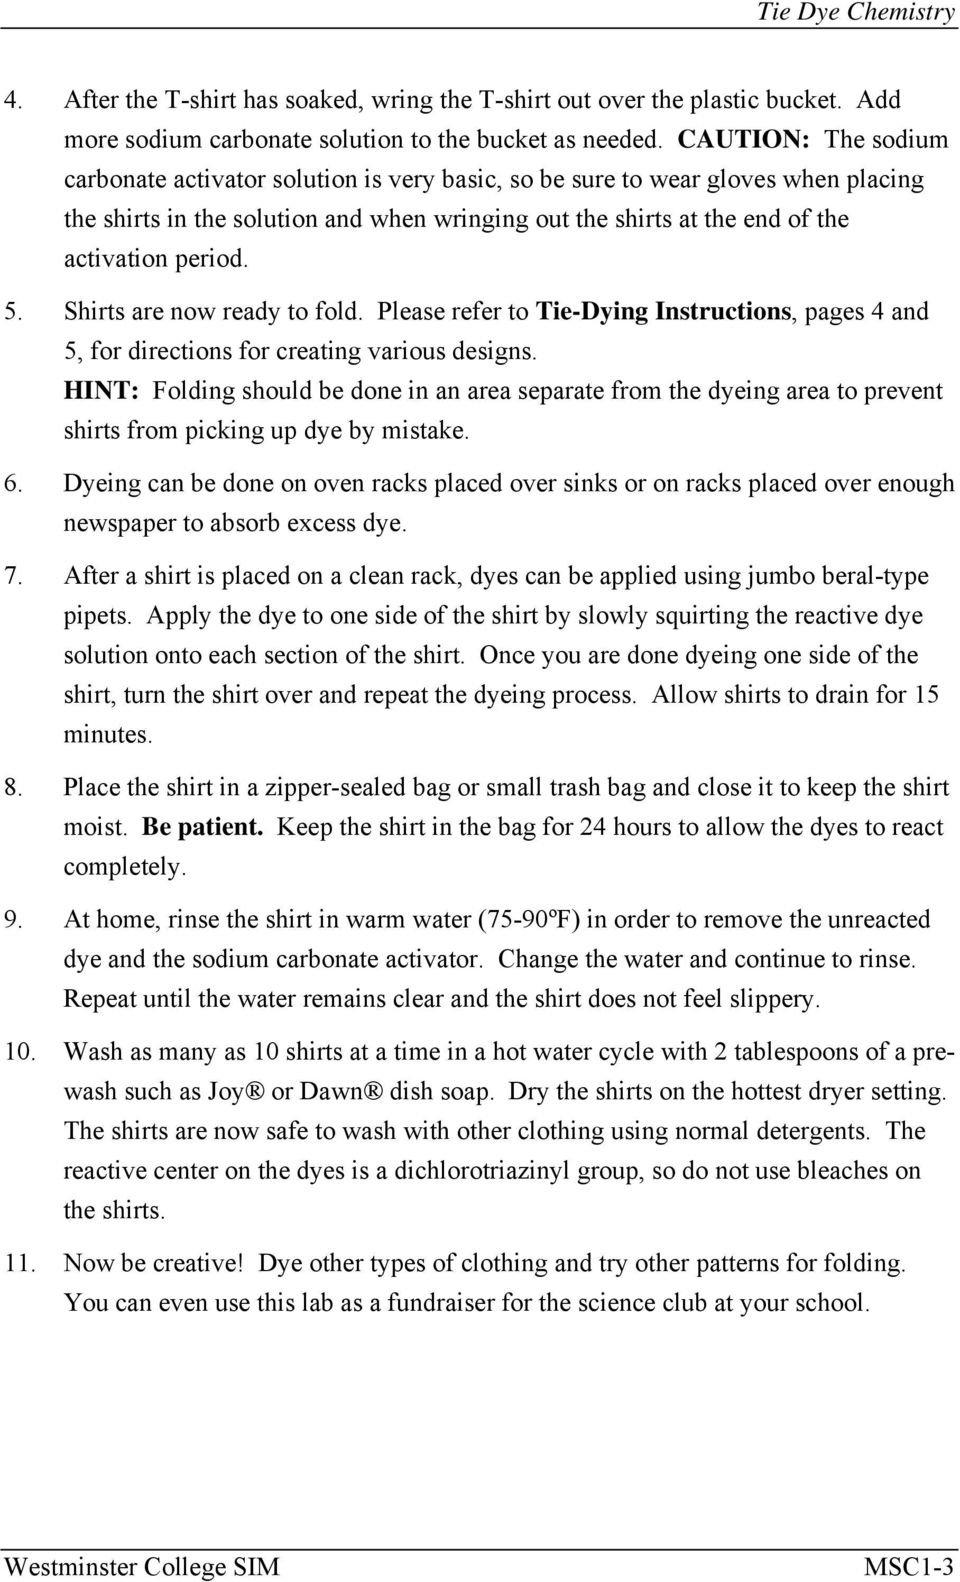 Tie Dye Chemistry Introduction Lab Msc 1 From Flinn Chem Fax Within Chemistry Of Tie Dye Worksheet